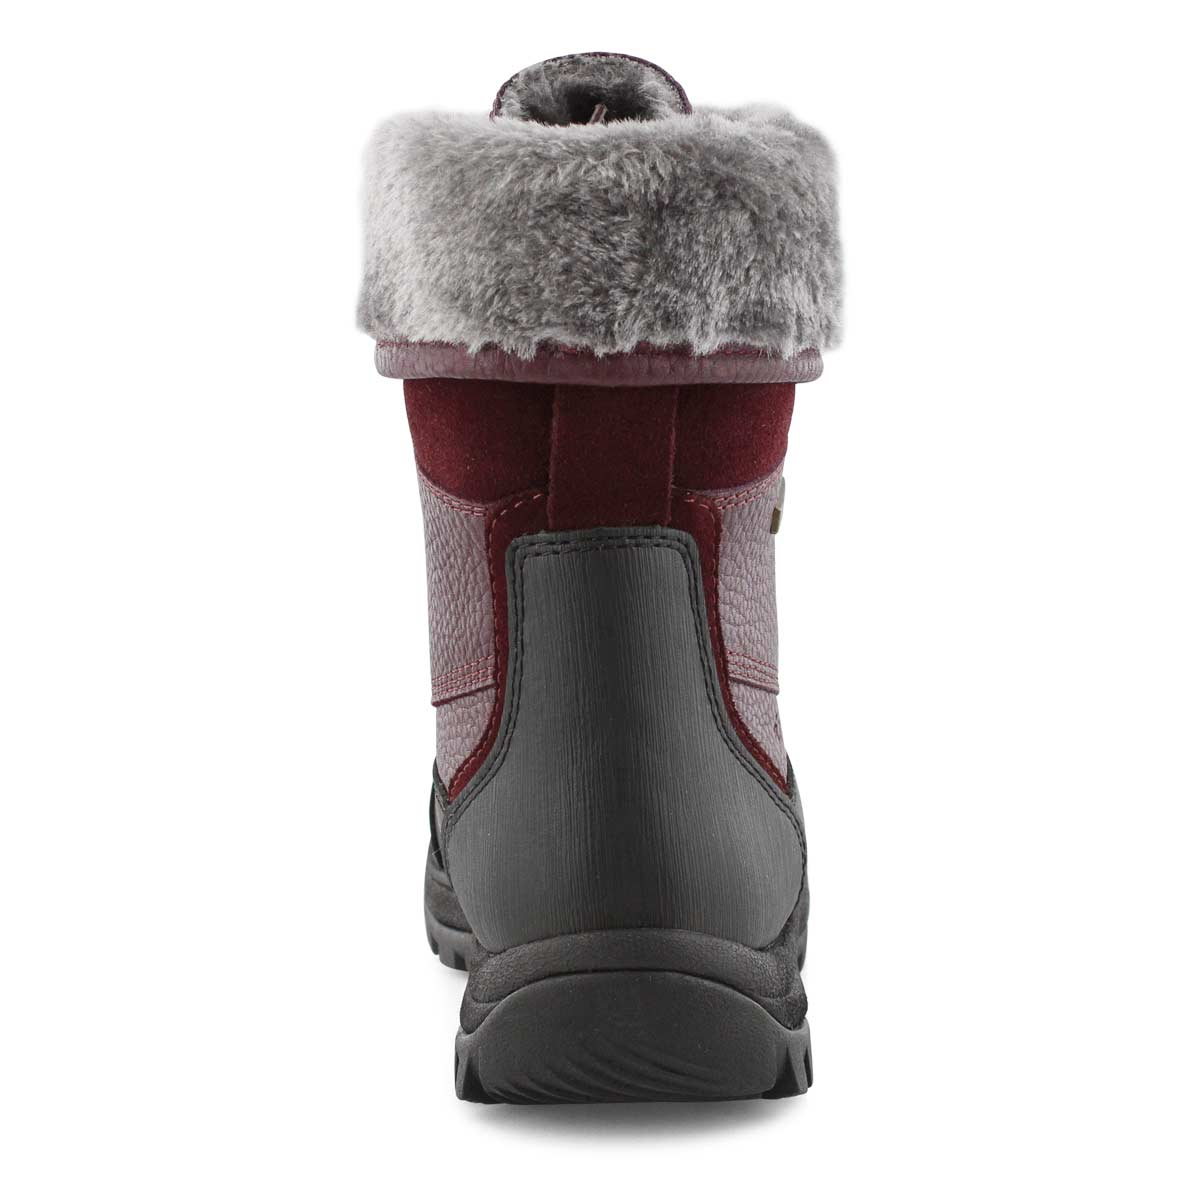 Lds Shakira 3 bgdy wp foldover cuff boot